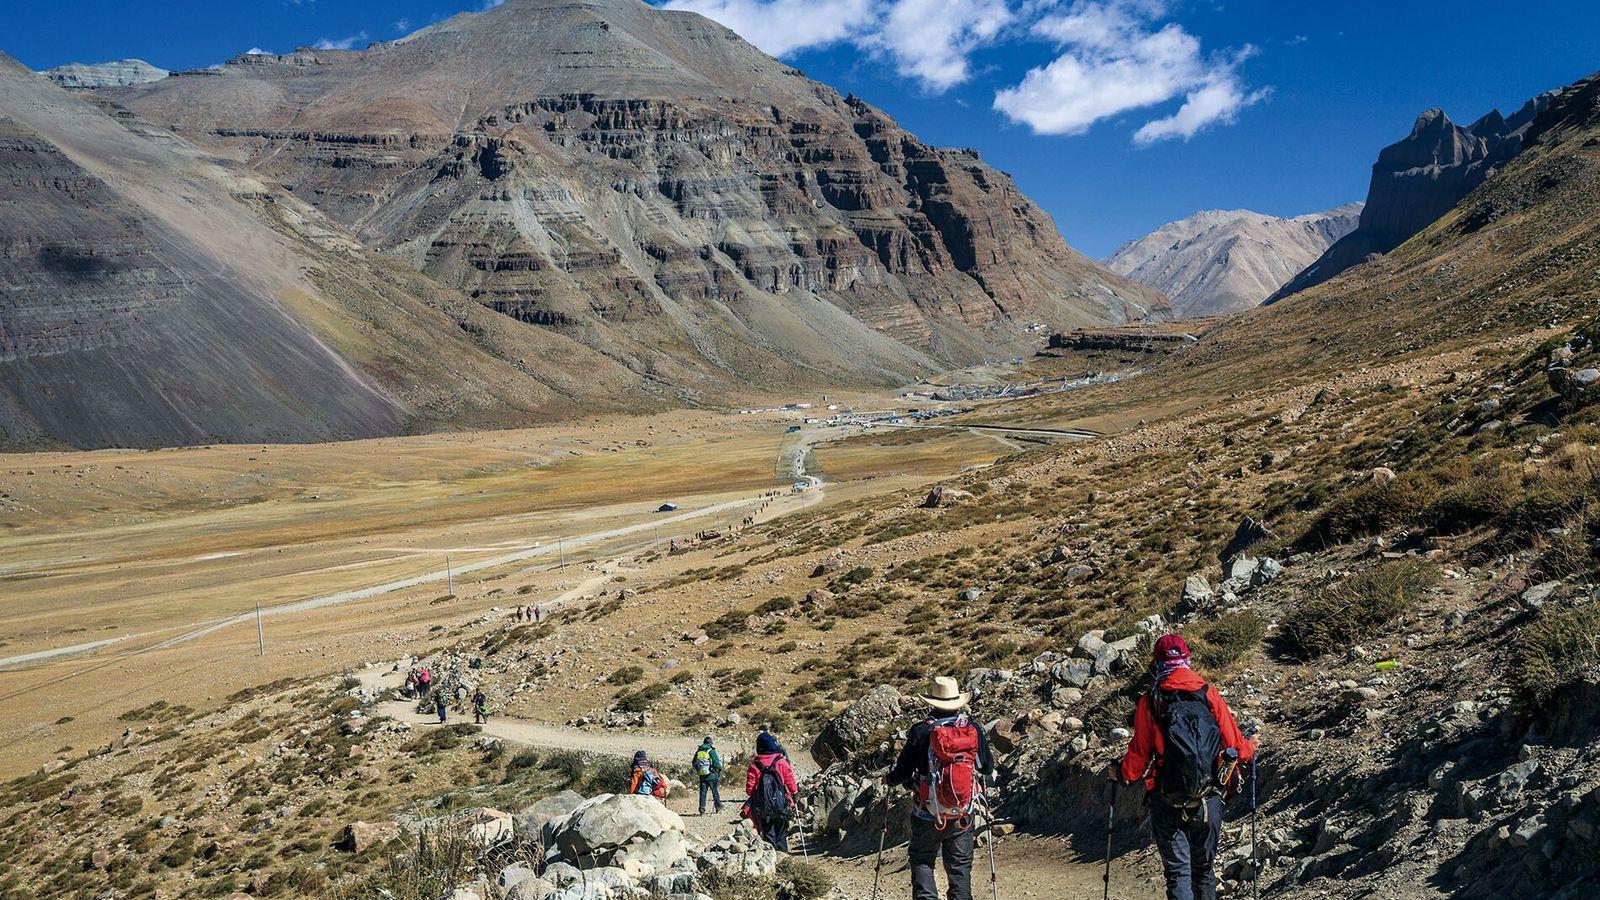 Hikers in the Tibet Autonomous Region on a kora (a type of pilgrimage), circumambulating Mount Kailash, ...